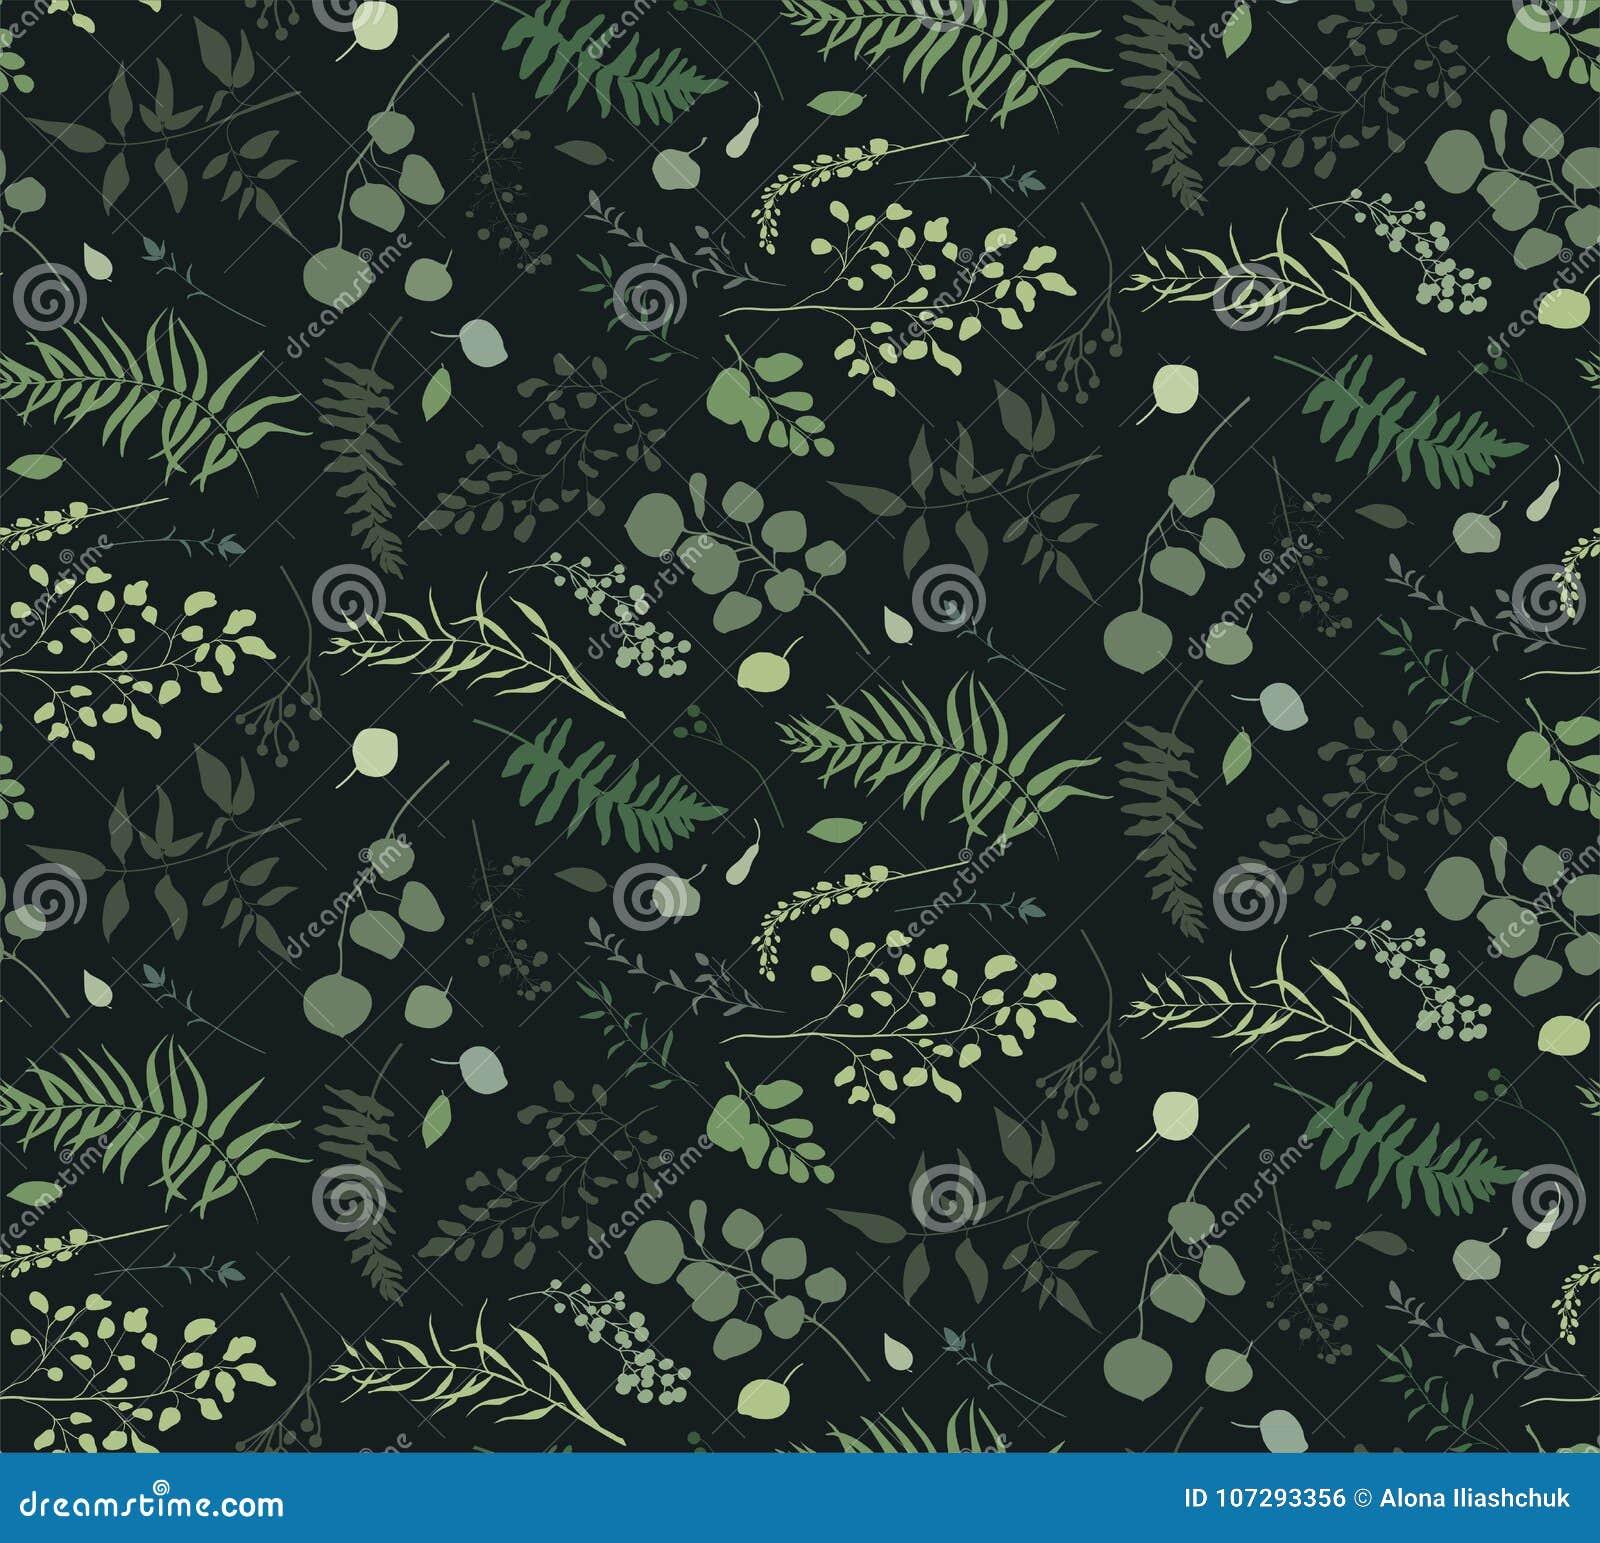 Modelo inconsútil árbol del helecho de la palma del eucalipto de diverso, follaje